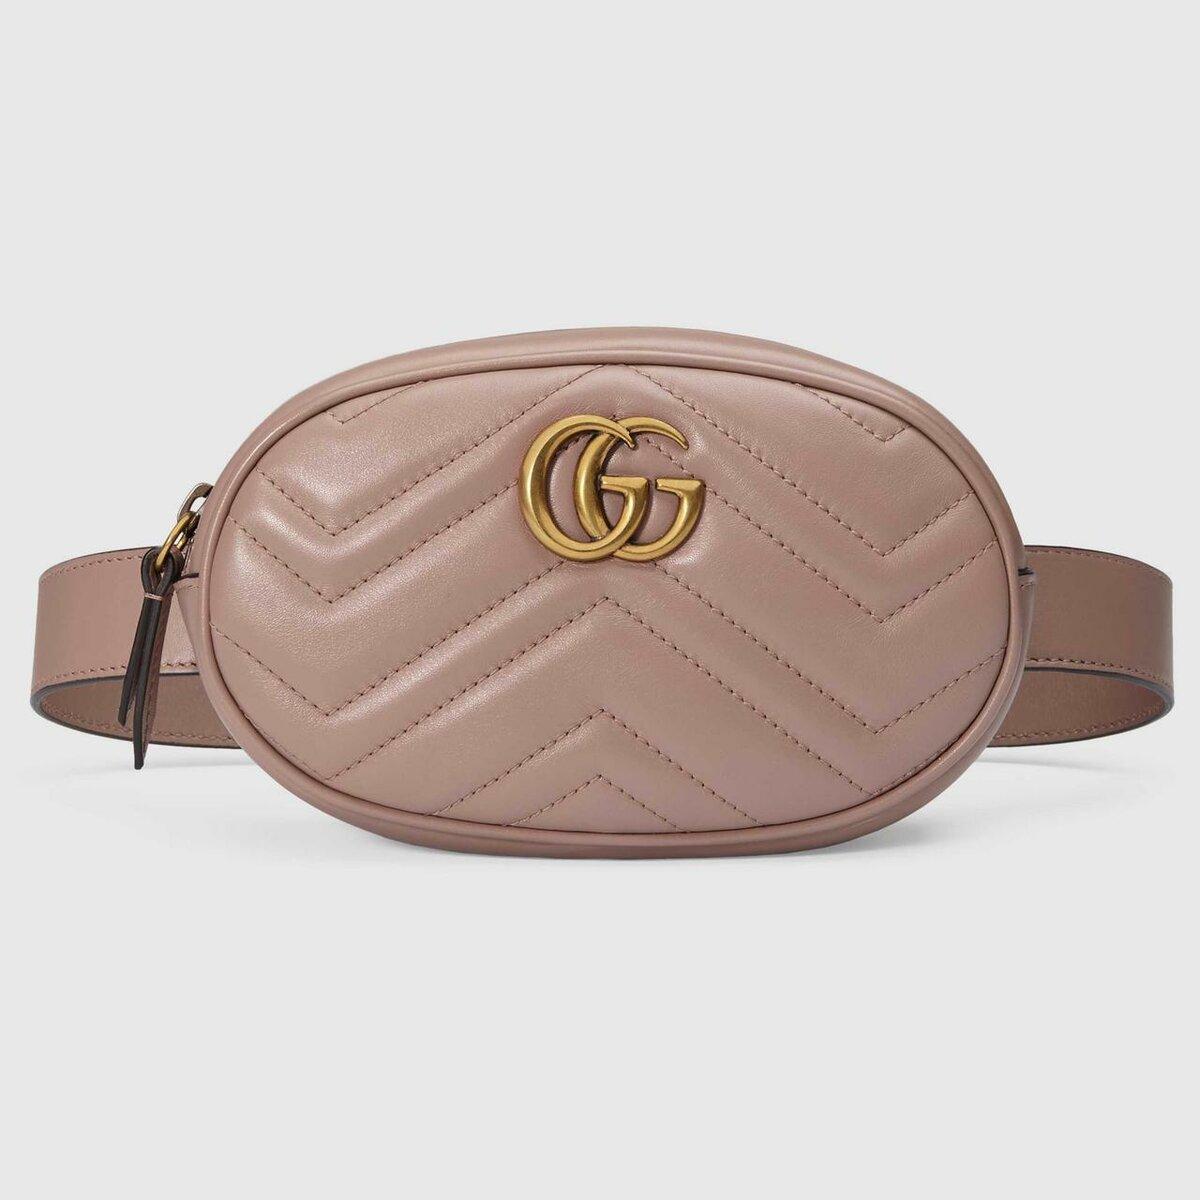 Поясная сумочка GG Marmont в Казани